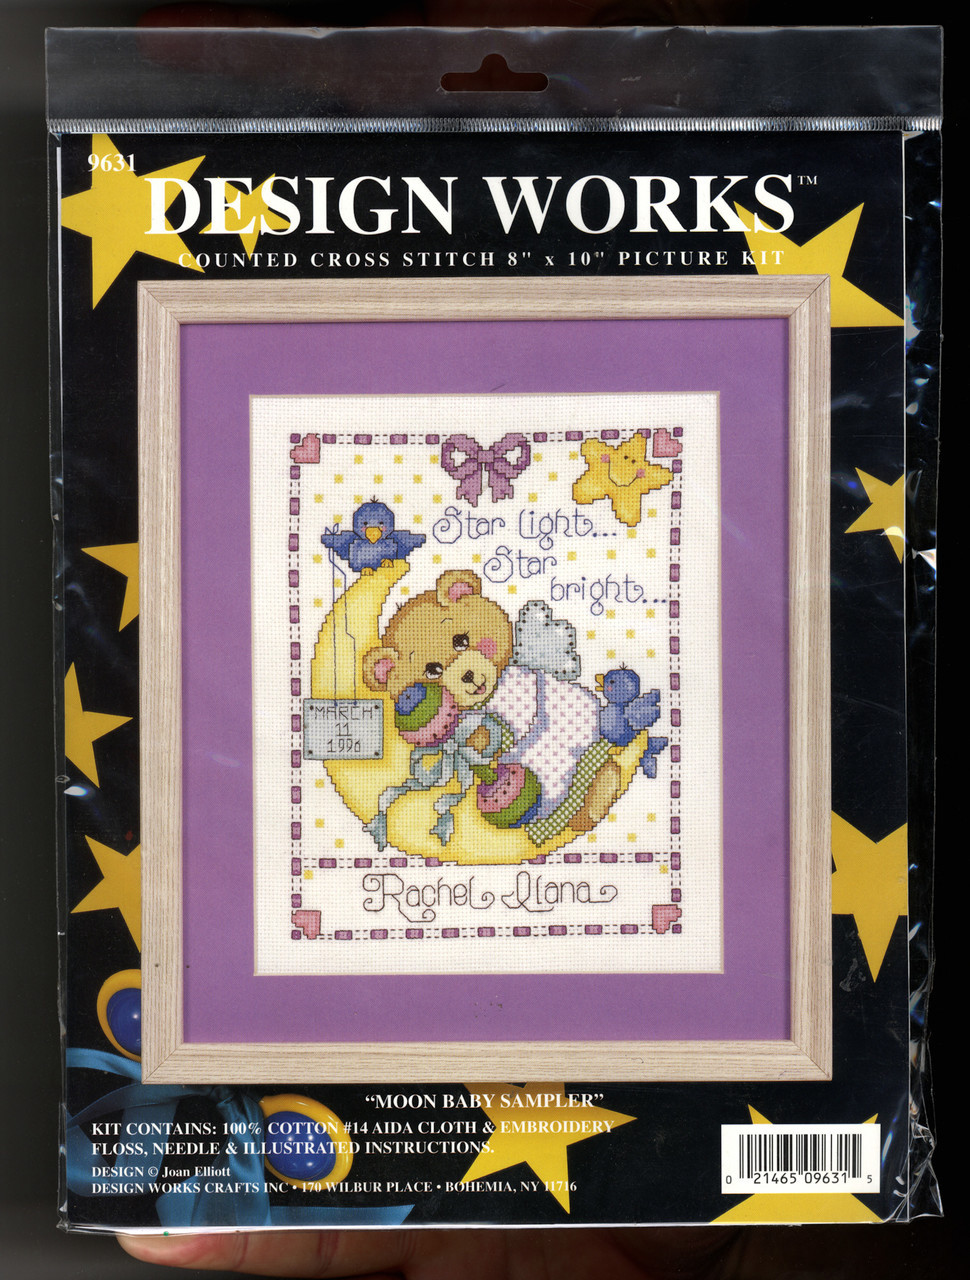 Design Works - Moon Baby Sampler